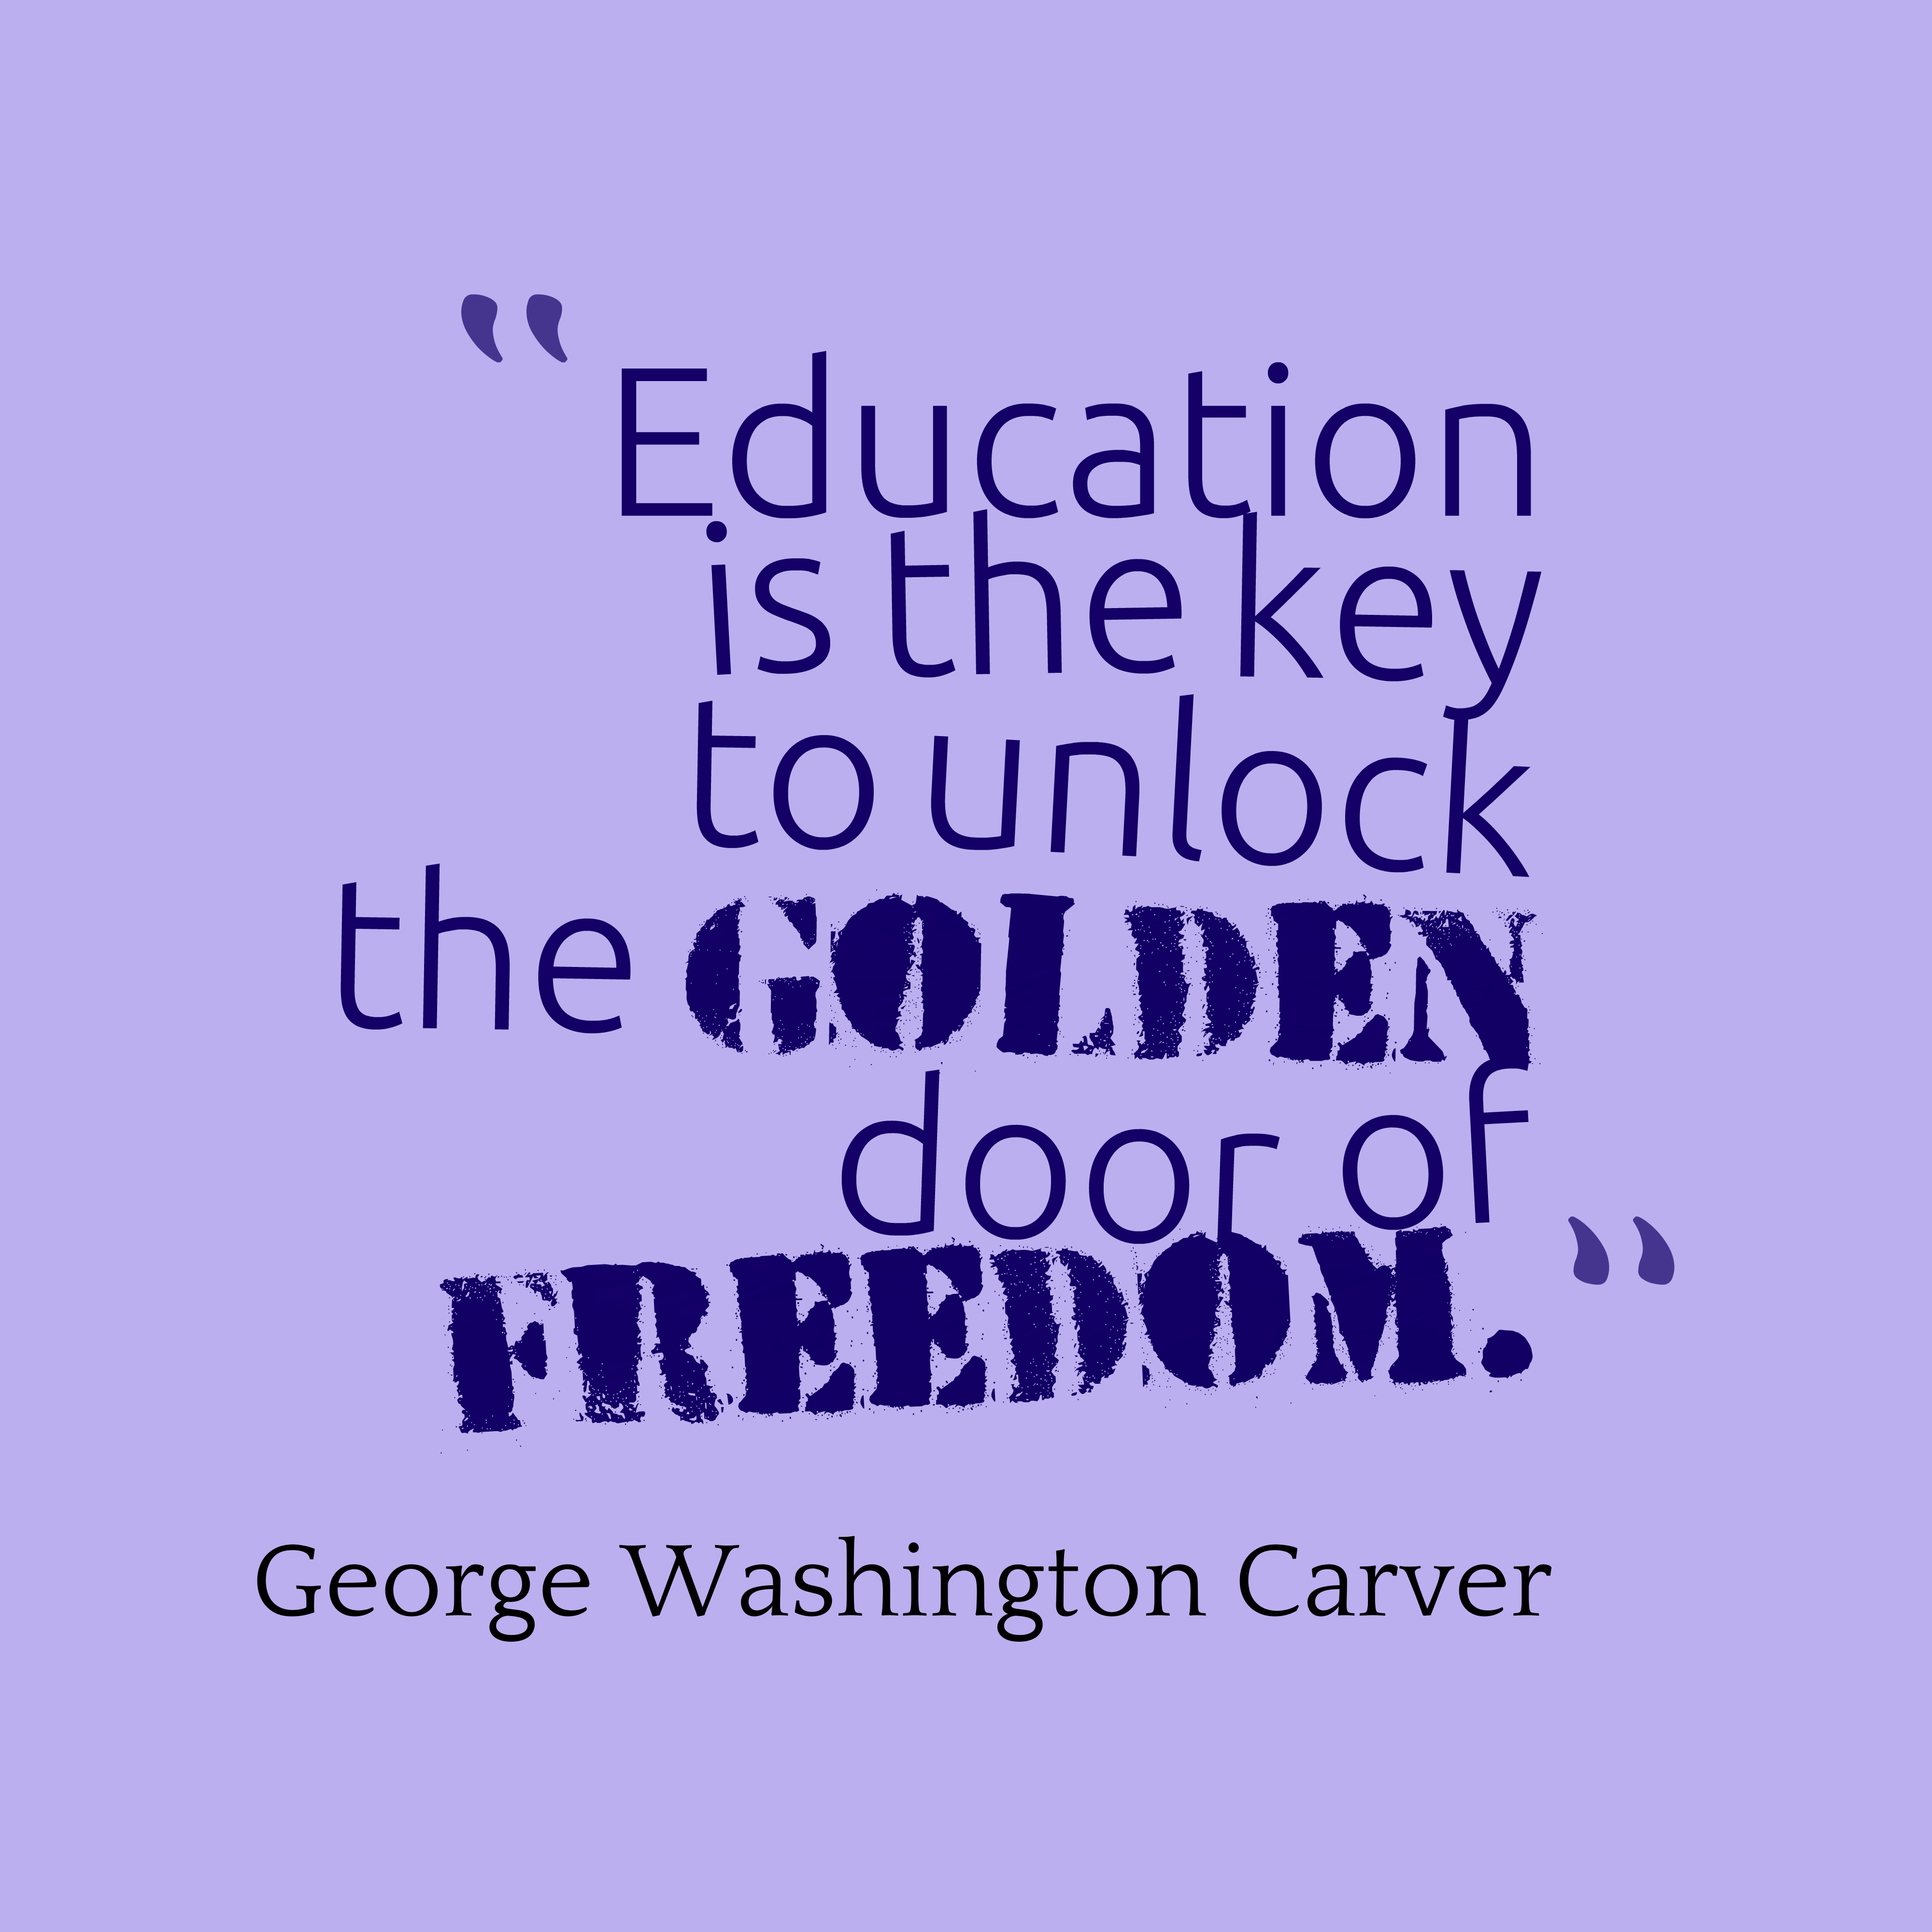 Online education quotes - Online Education Quotes 7